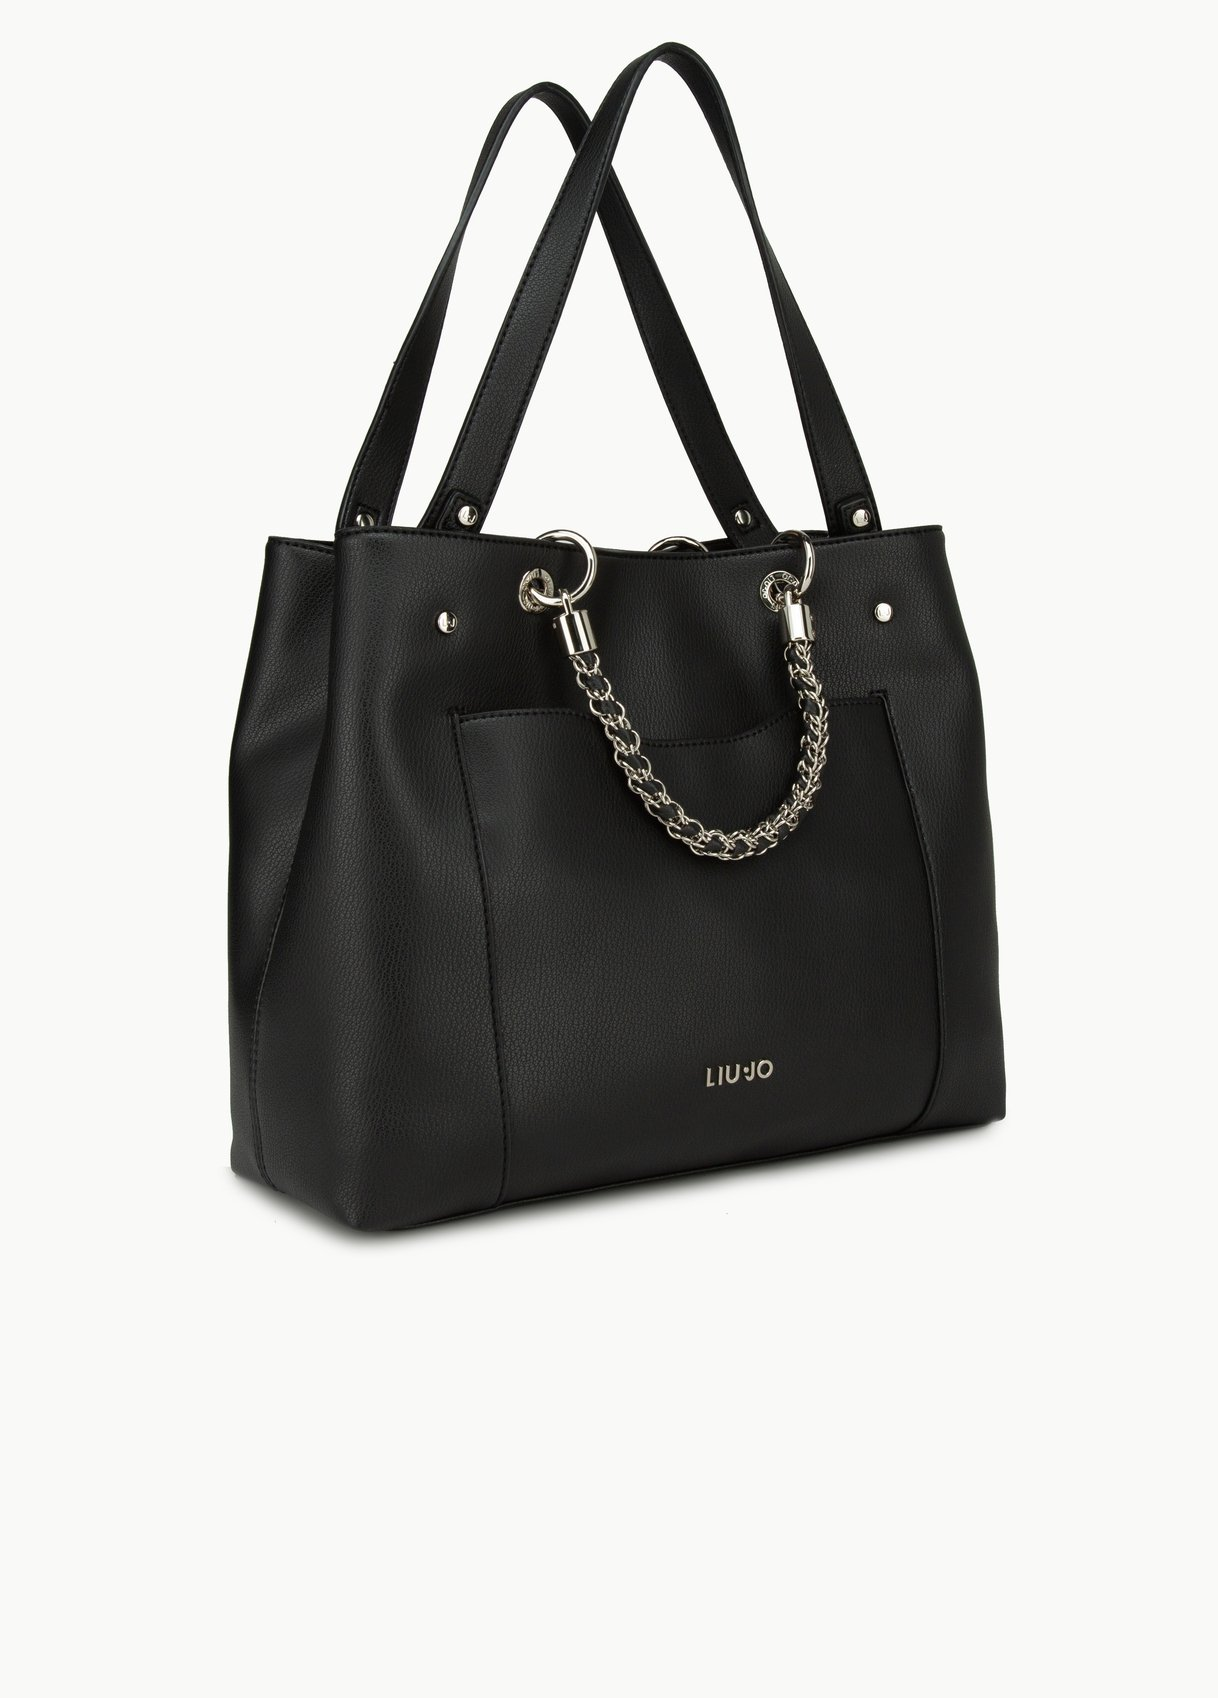 Shopping bag in similpelle autunno inverno 2019 2020 prezzo 179 euro